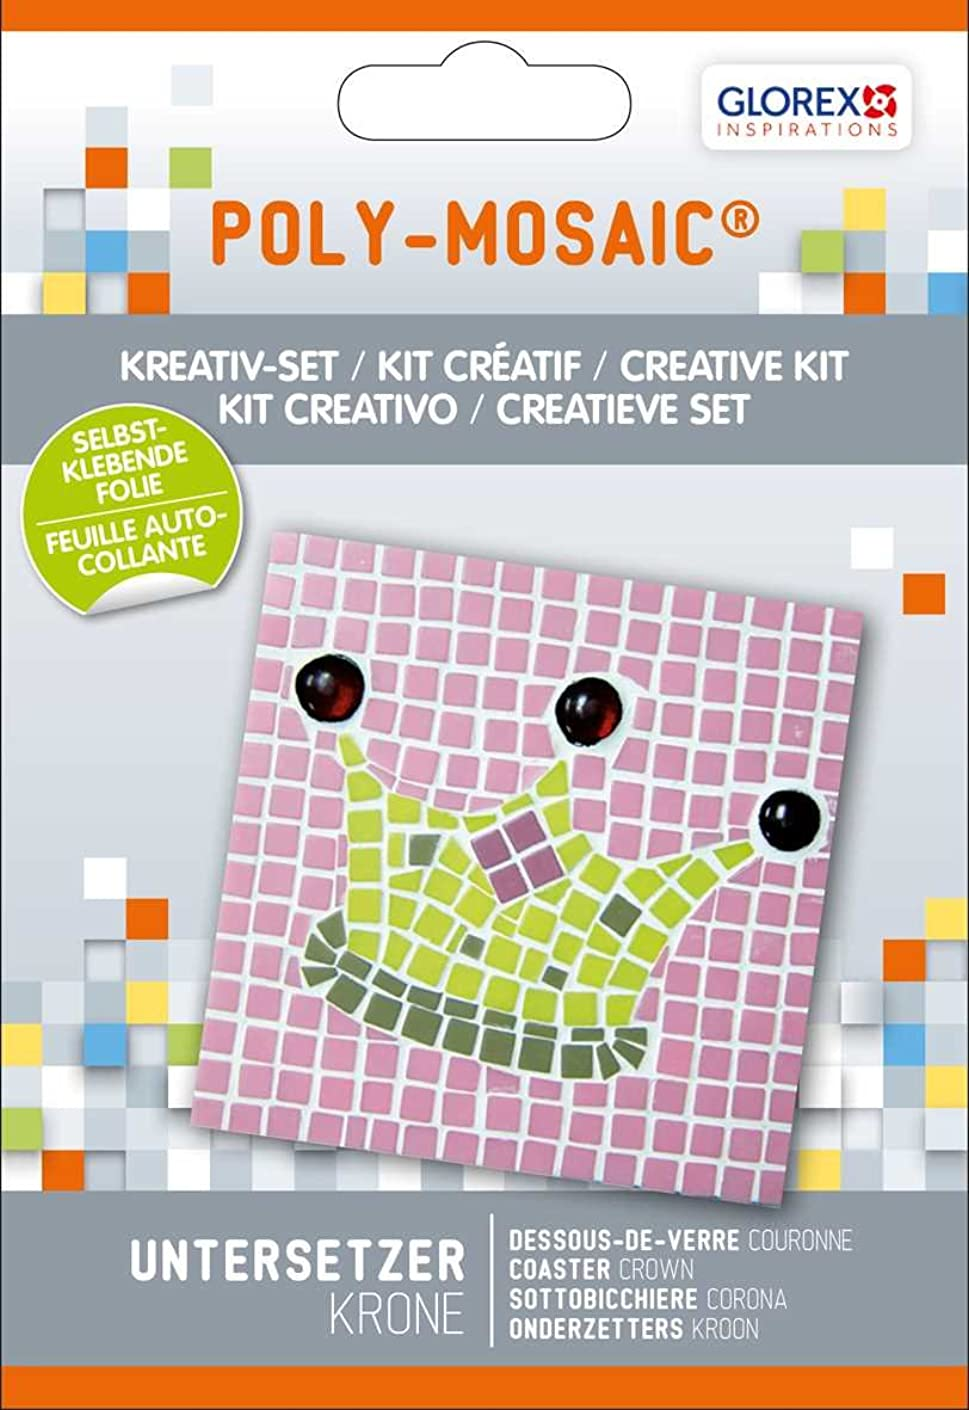 Glorex Poly Mosaic Creative Set, Plastic, Multicoloured, 17?x 11.6?x 1?cm